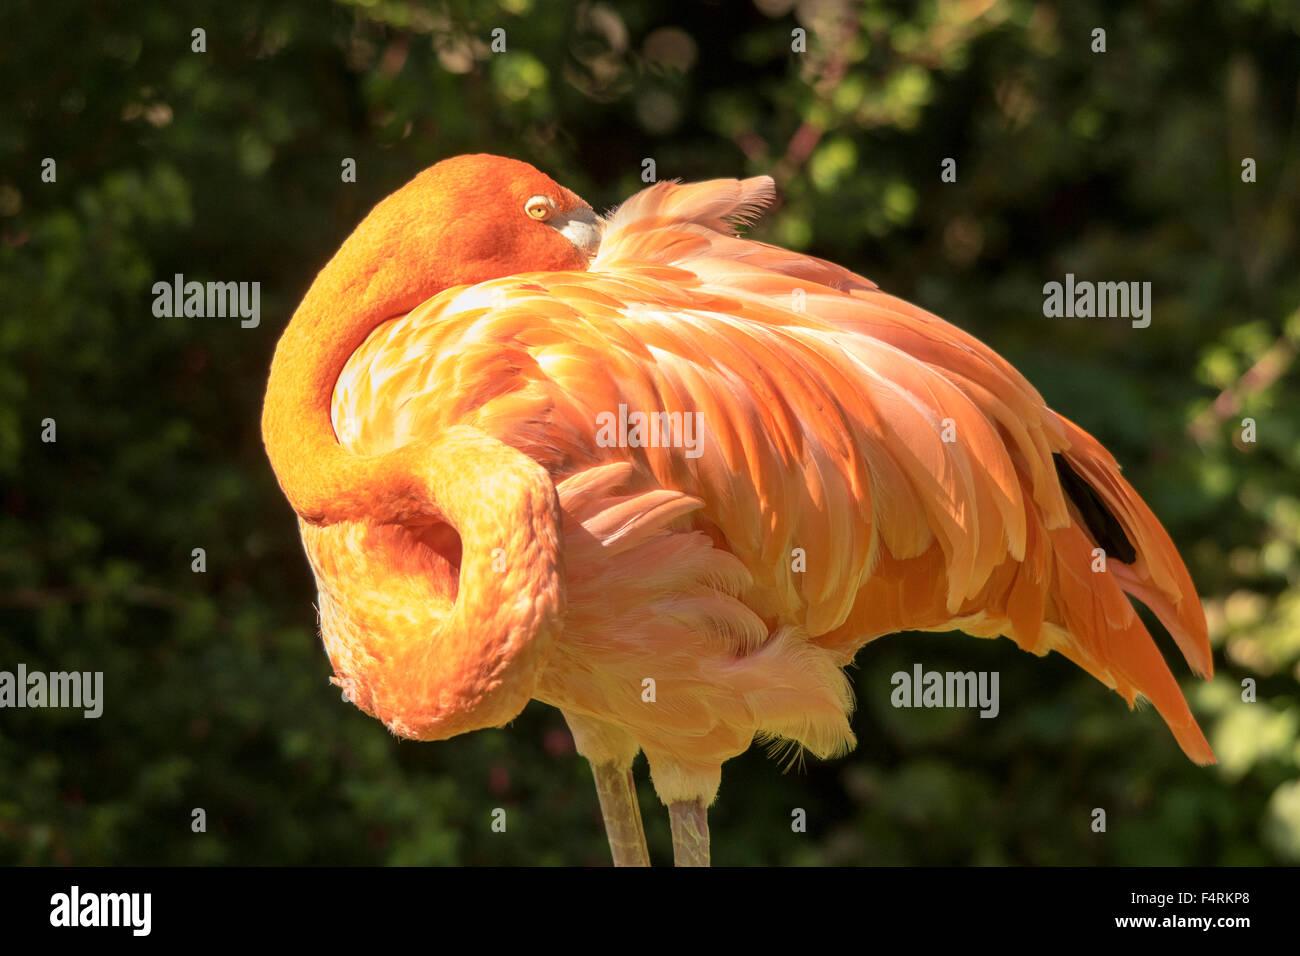 Flamingo, Bird, Aves, Phoenicopterus minor - Stock Image